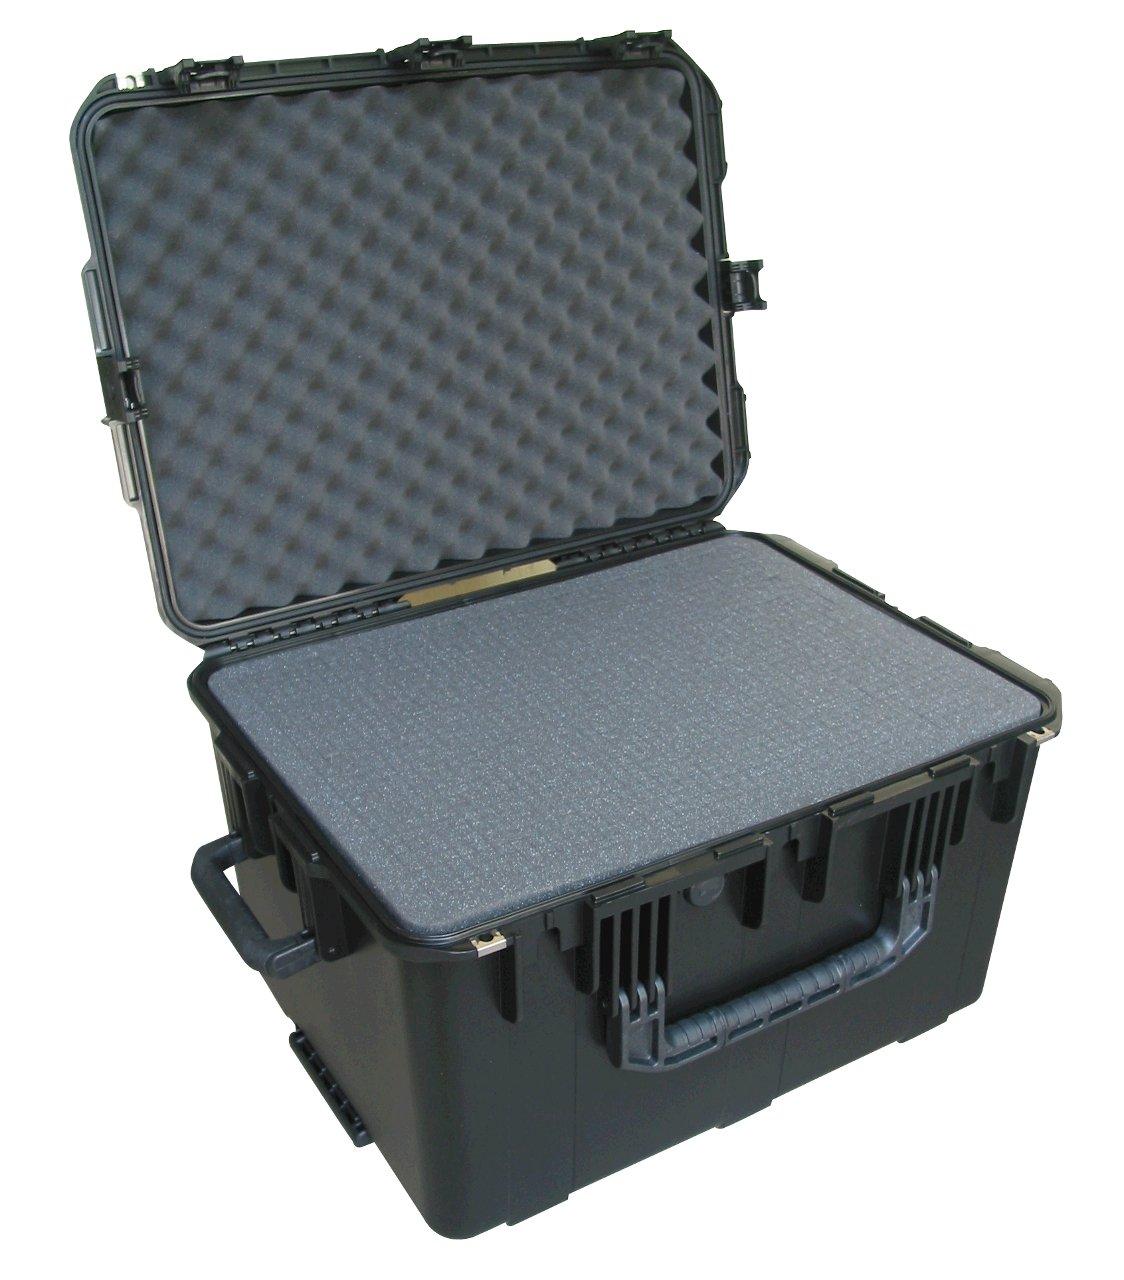 valise-antichoc.jpg